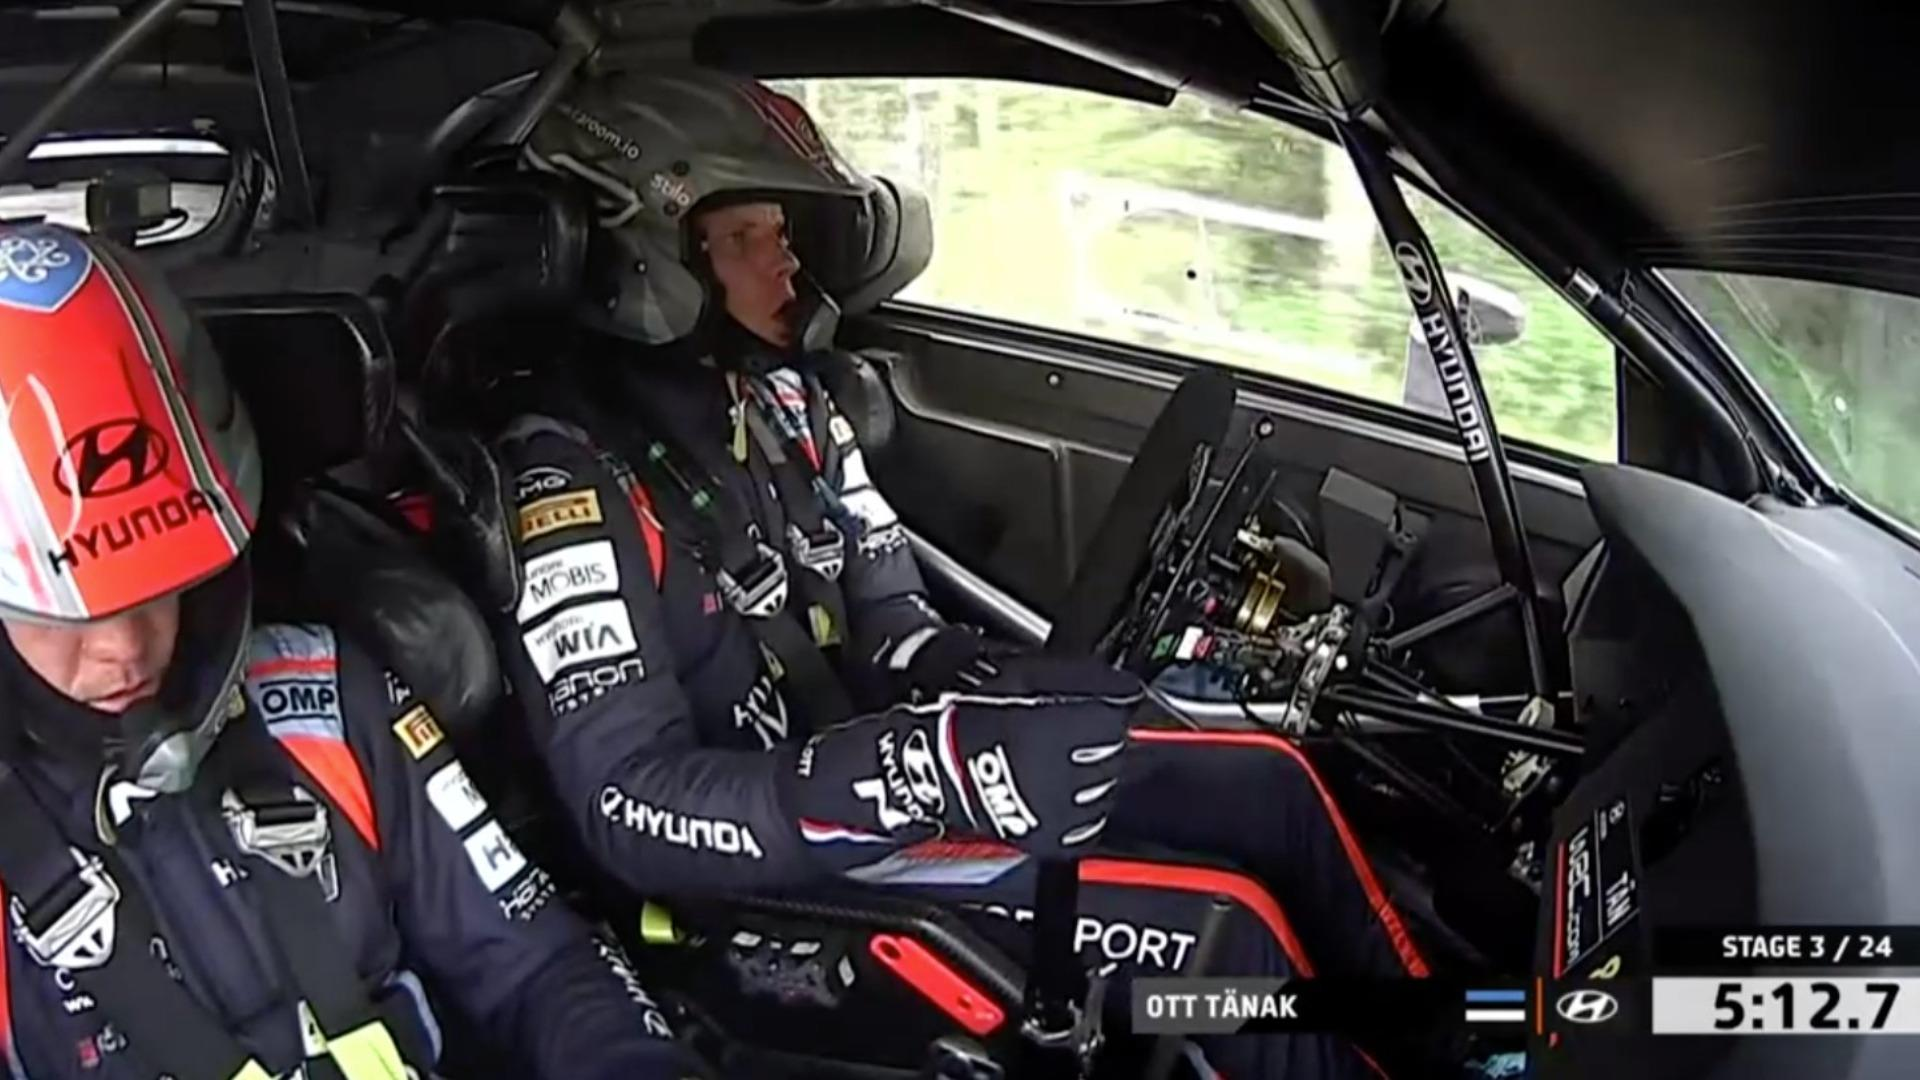 Tänak picks up puncture on SS3